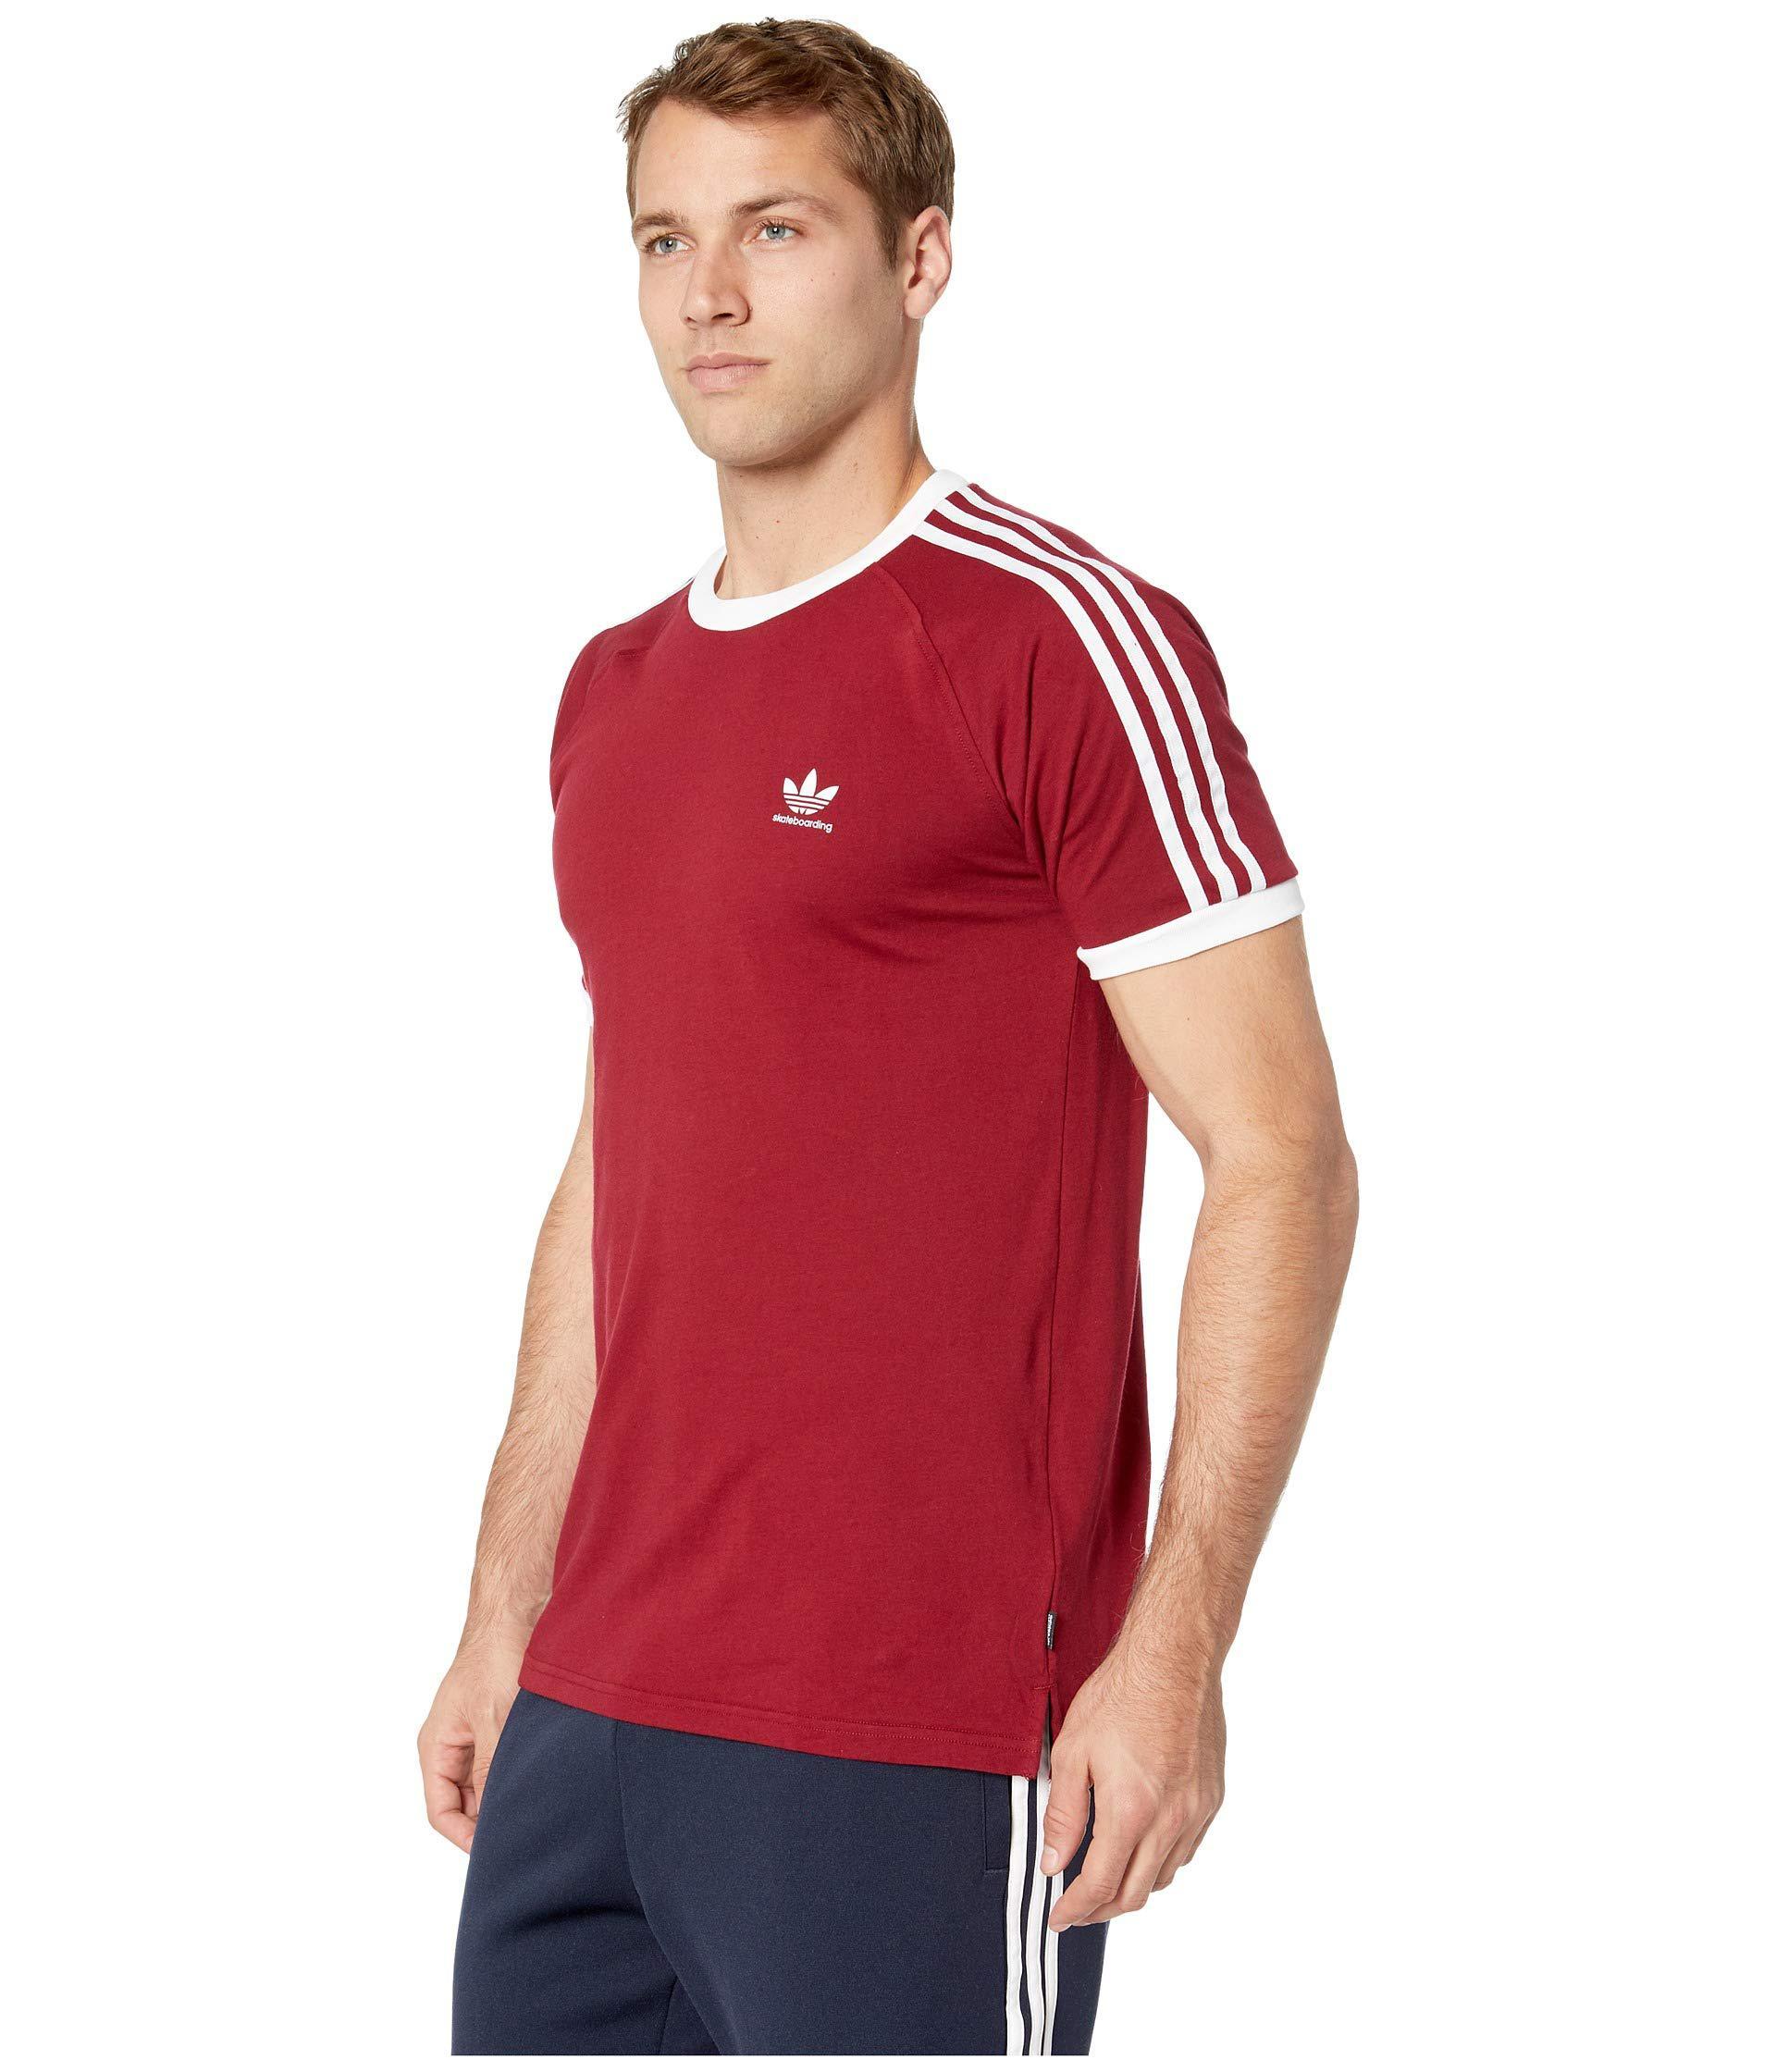 fc27c1d310a6e8 Lyst - adidas Originals California 2.0 Tee (black white) Men s T Shirt in  Red for Men